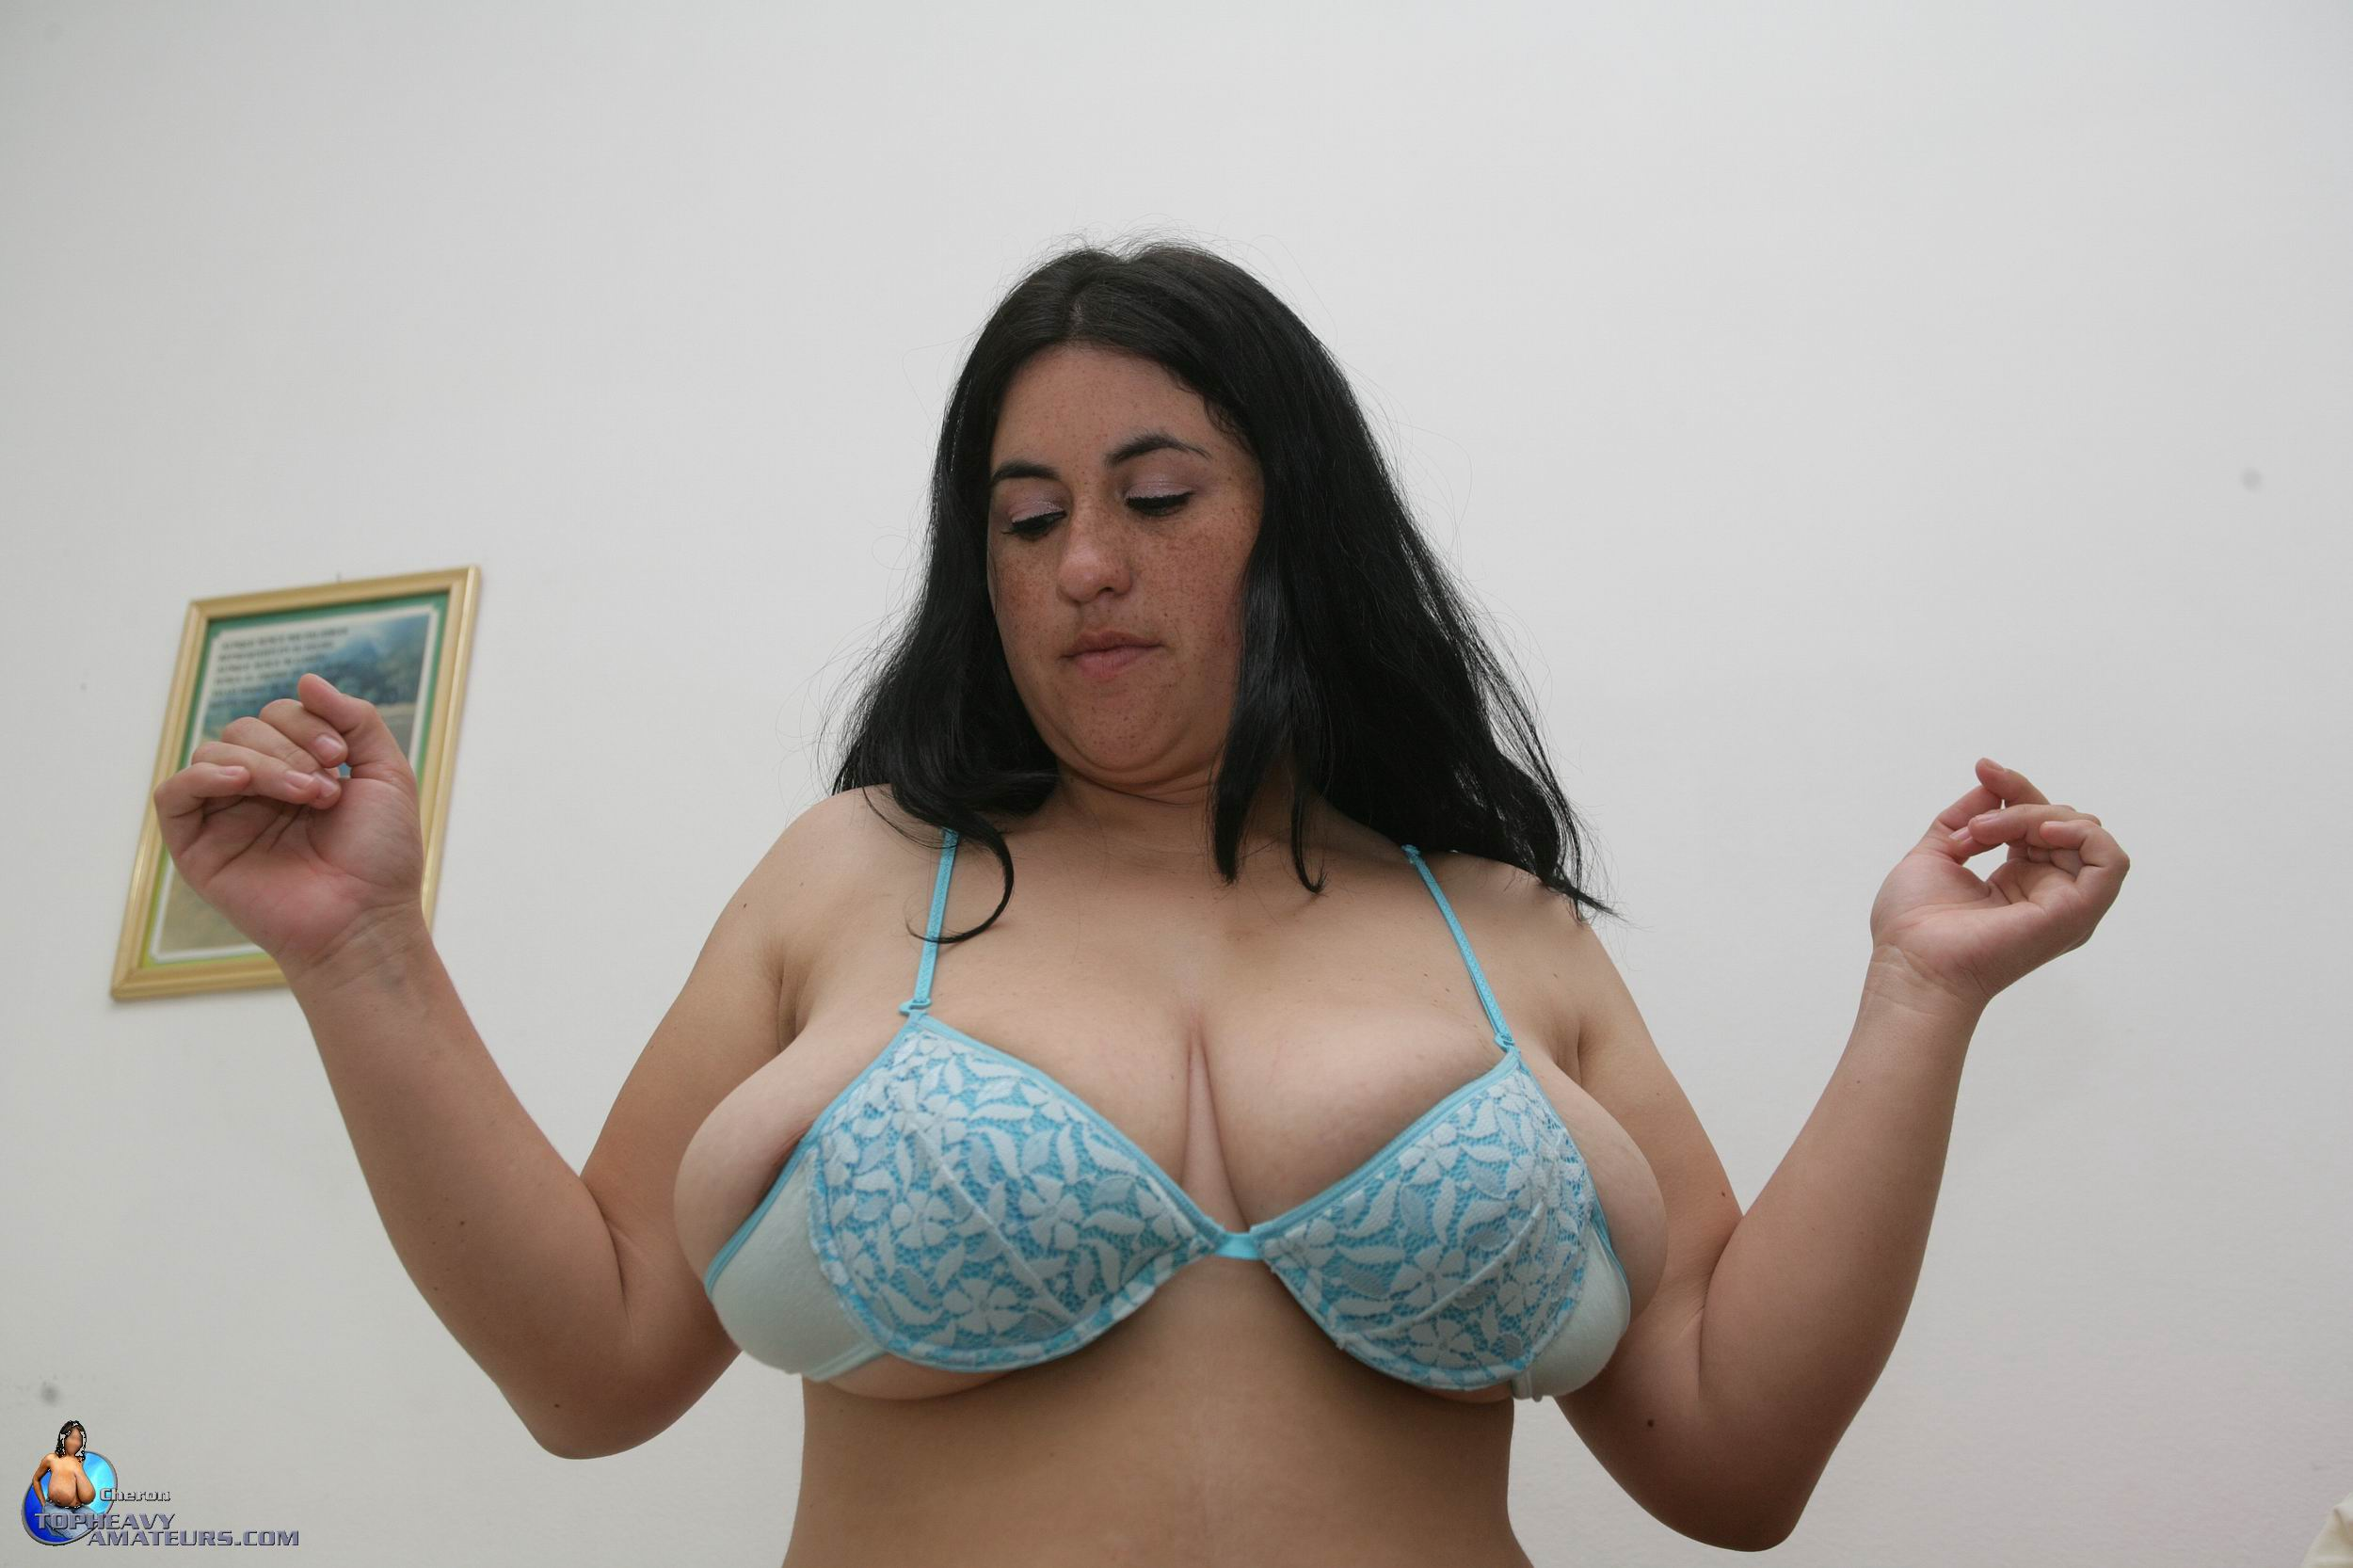 Hot busty gal amateur live cam video 2